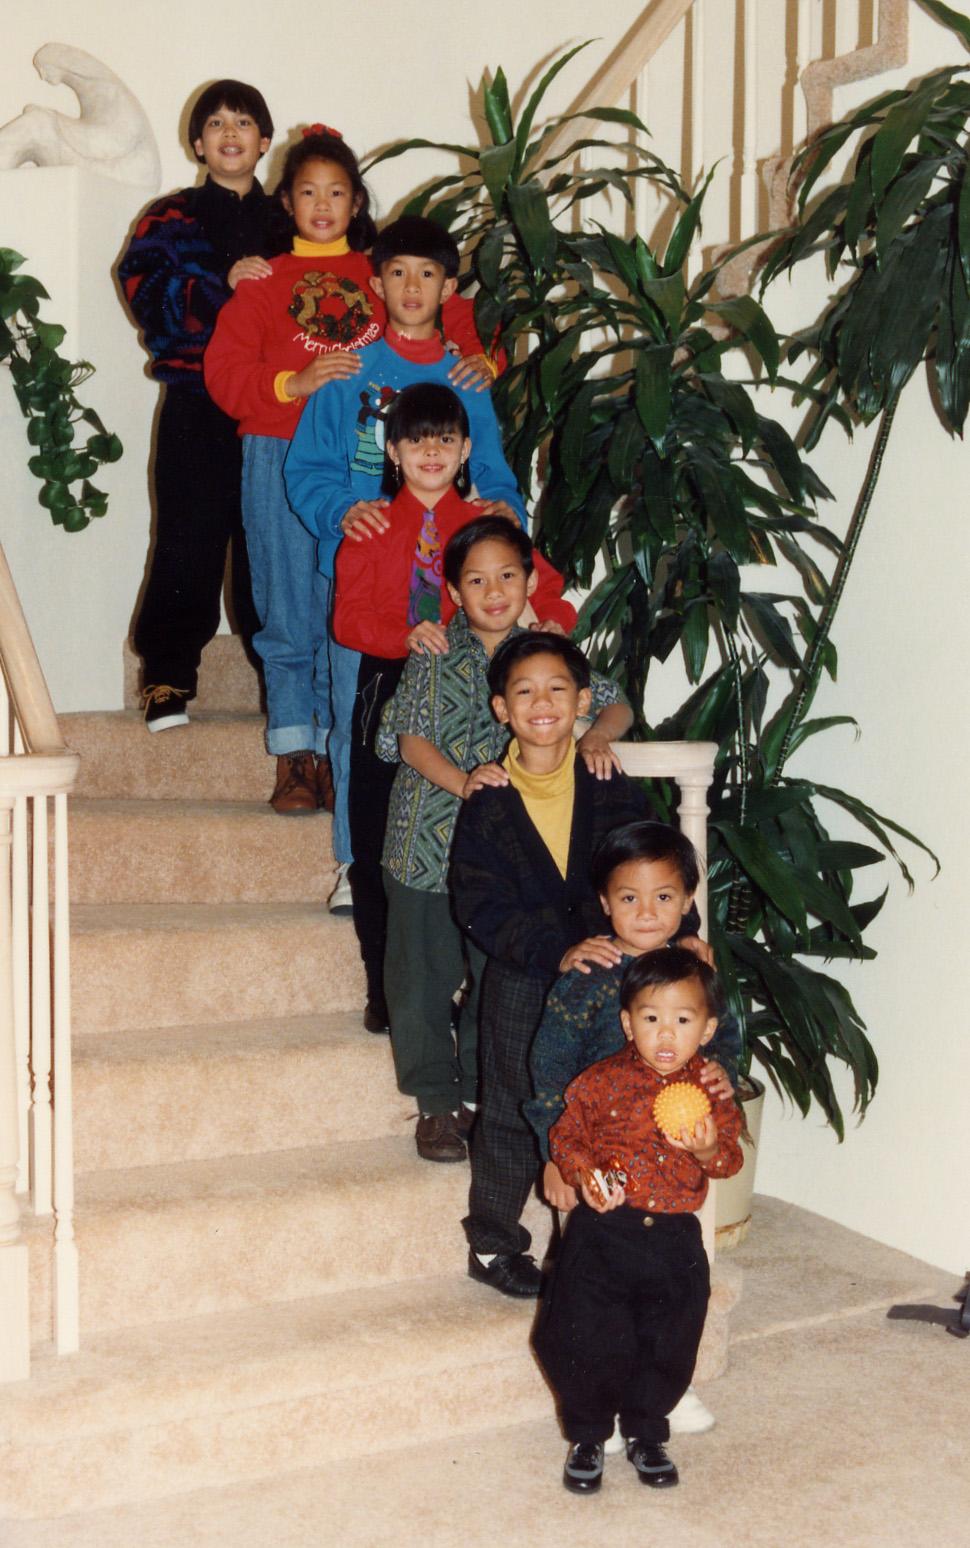 294 family Xmas pic 1997.jpg